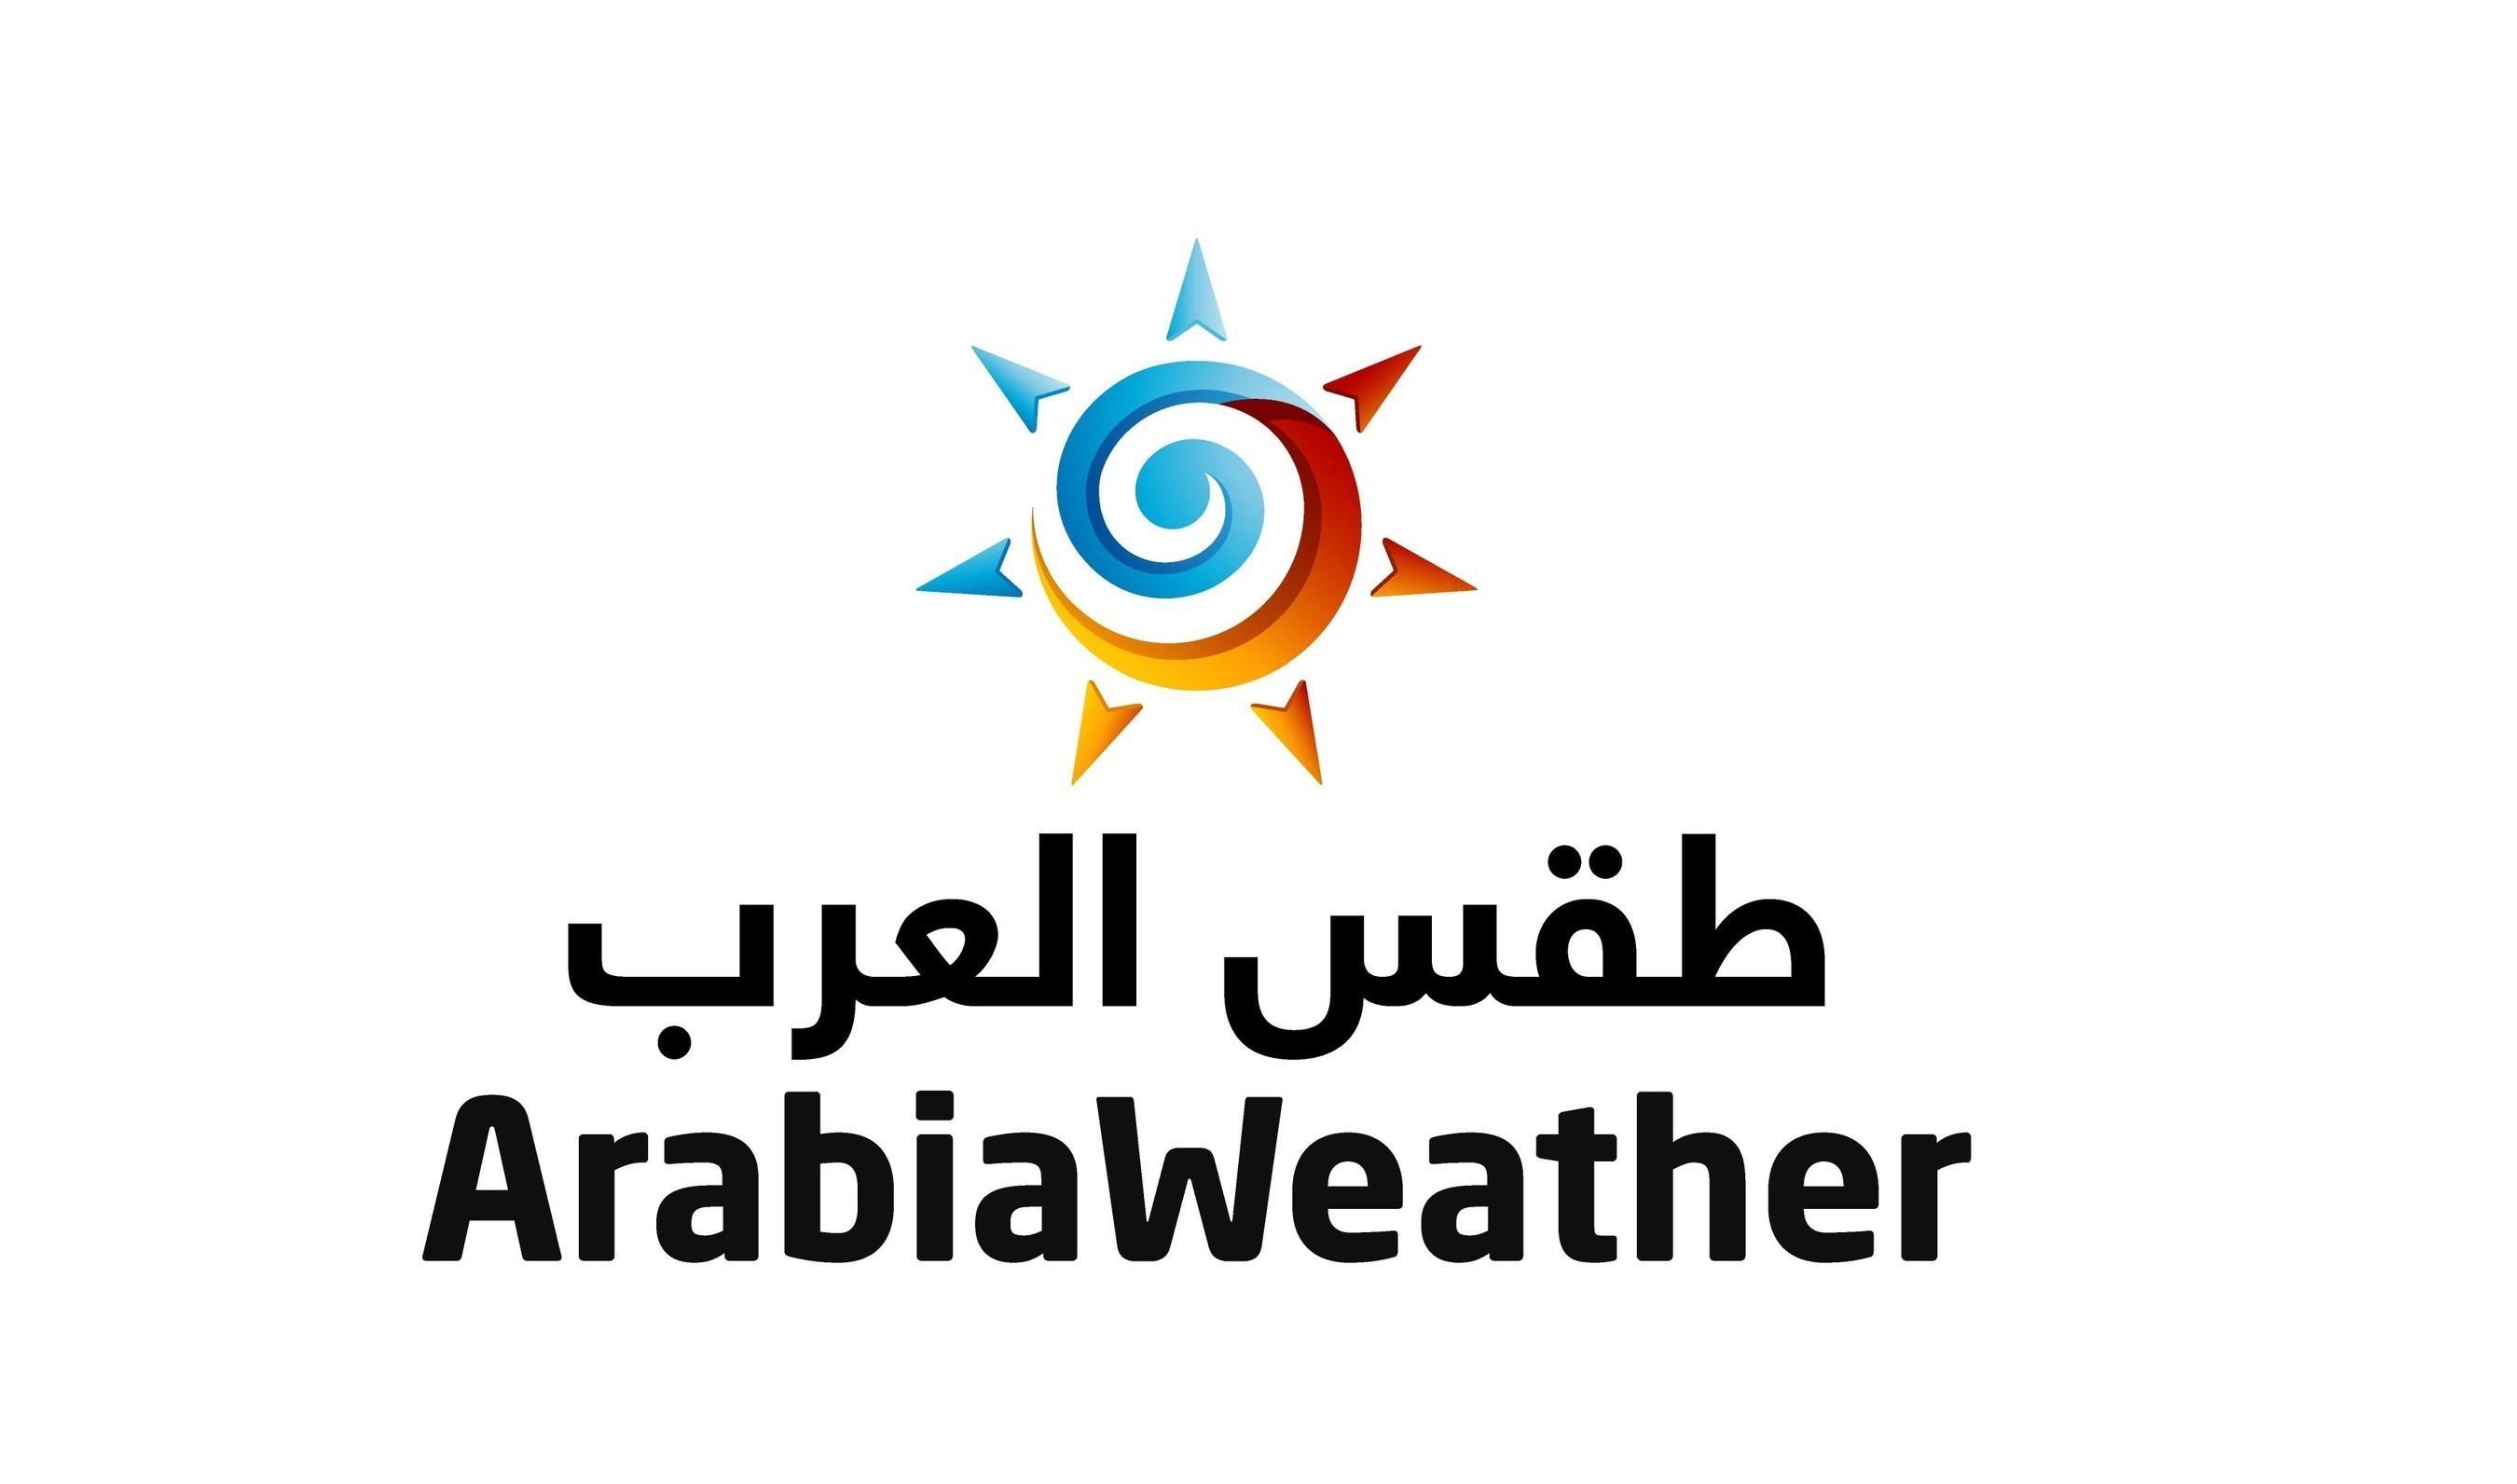 ArabiaWeather Forms Standalone Meteorology Department